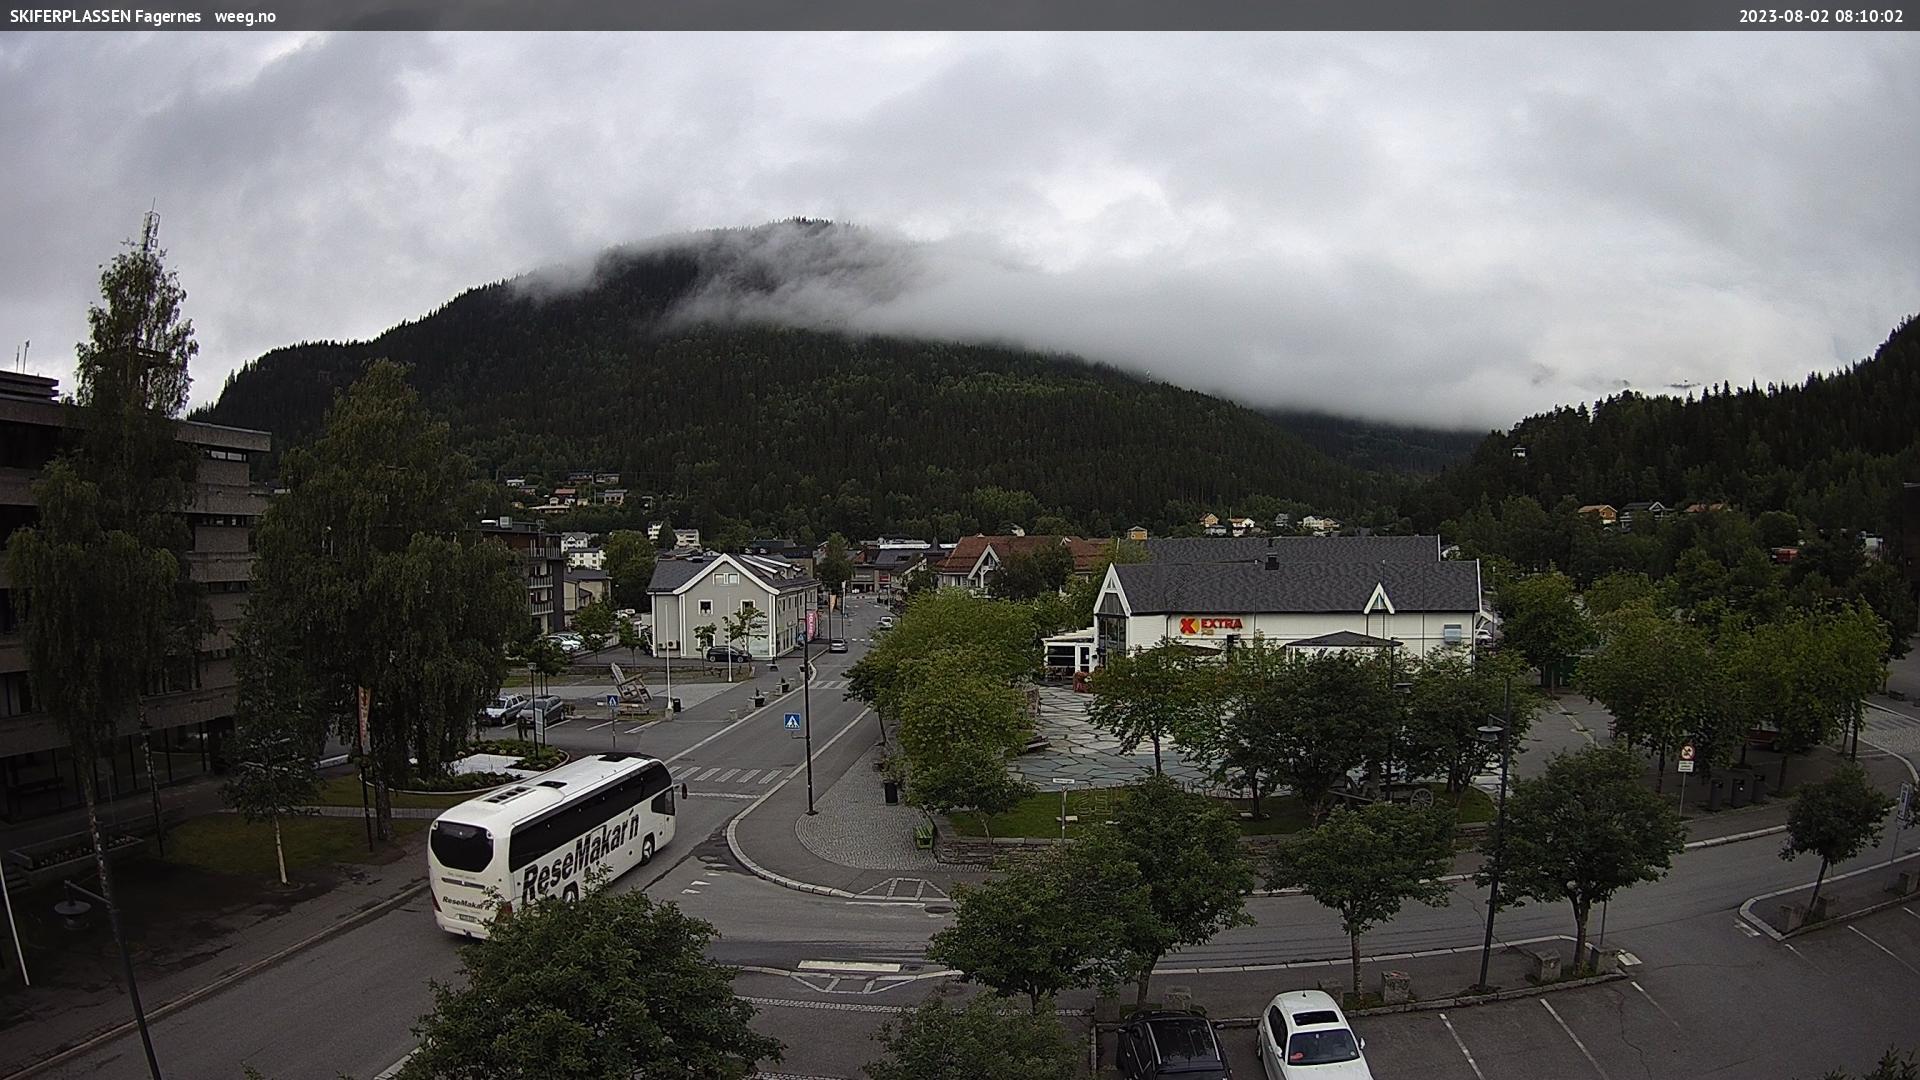 Webcam Fagernes, Nord-Aurdal, Oppland, Norwegen